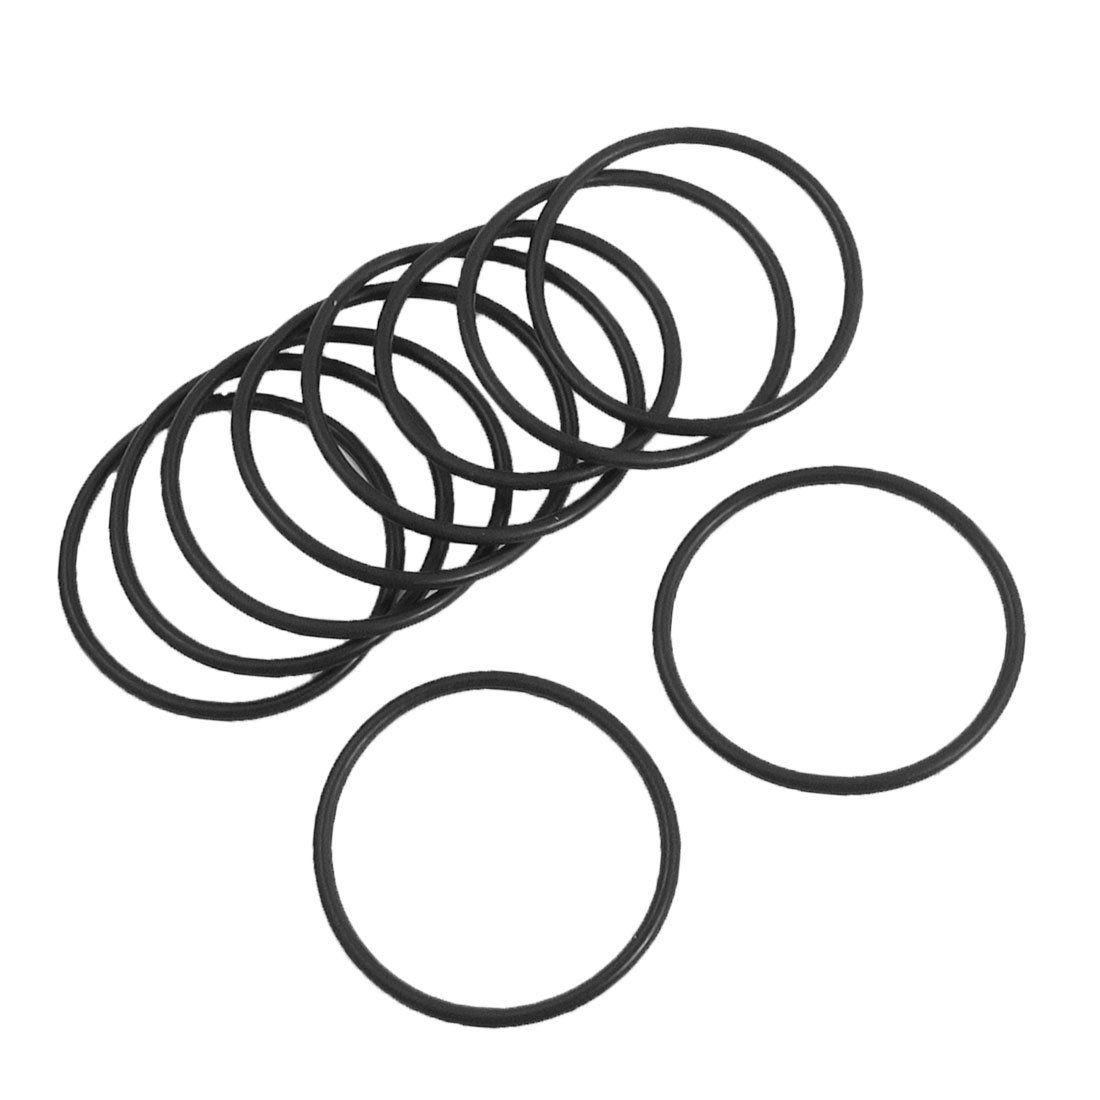 10 St/ück schwarz Nitrilgummi O-Ringe NBR Dichtung Grommets 42mm x 52mm x 5mm